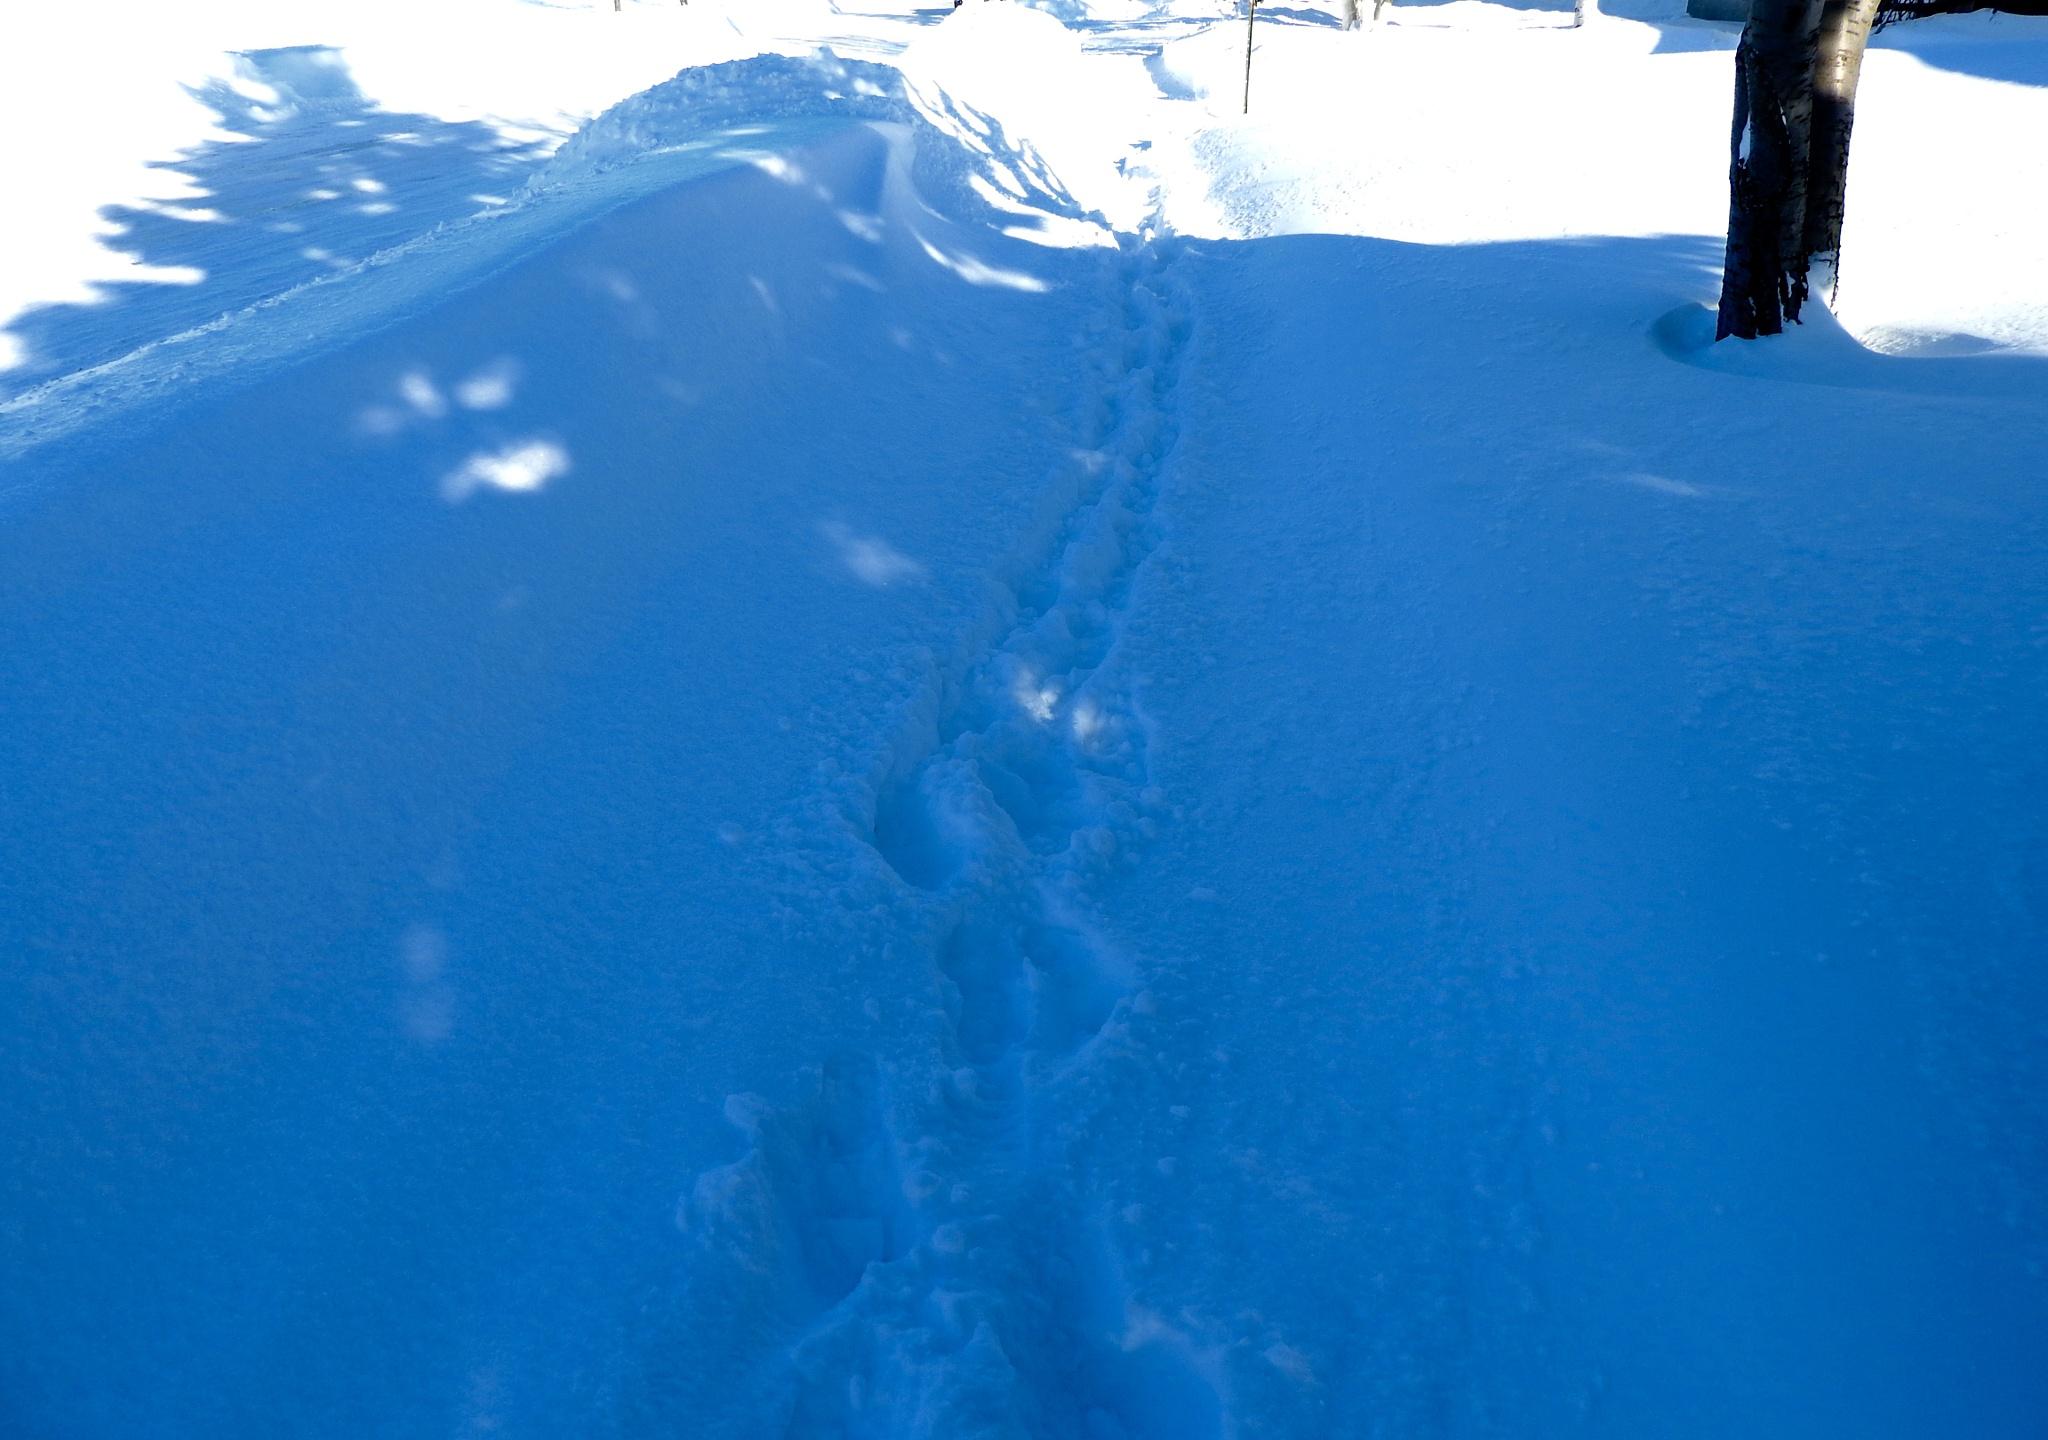 No sidewalk plow yet ;) by Lorraine Furmanic